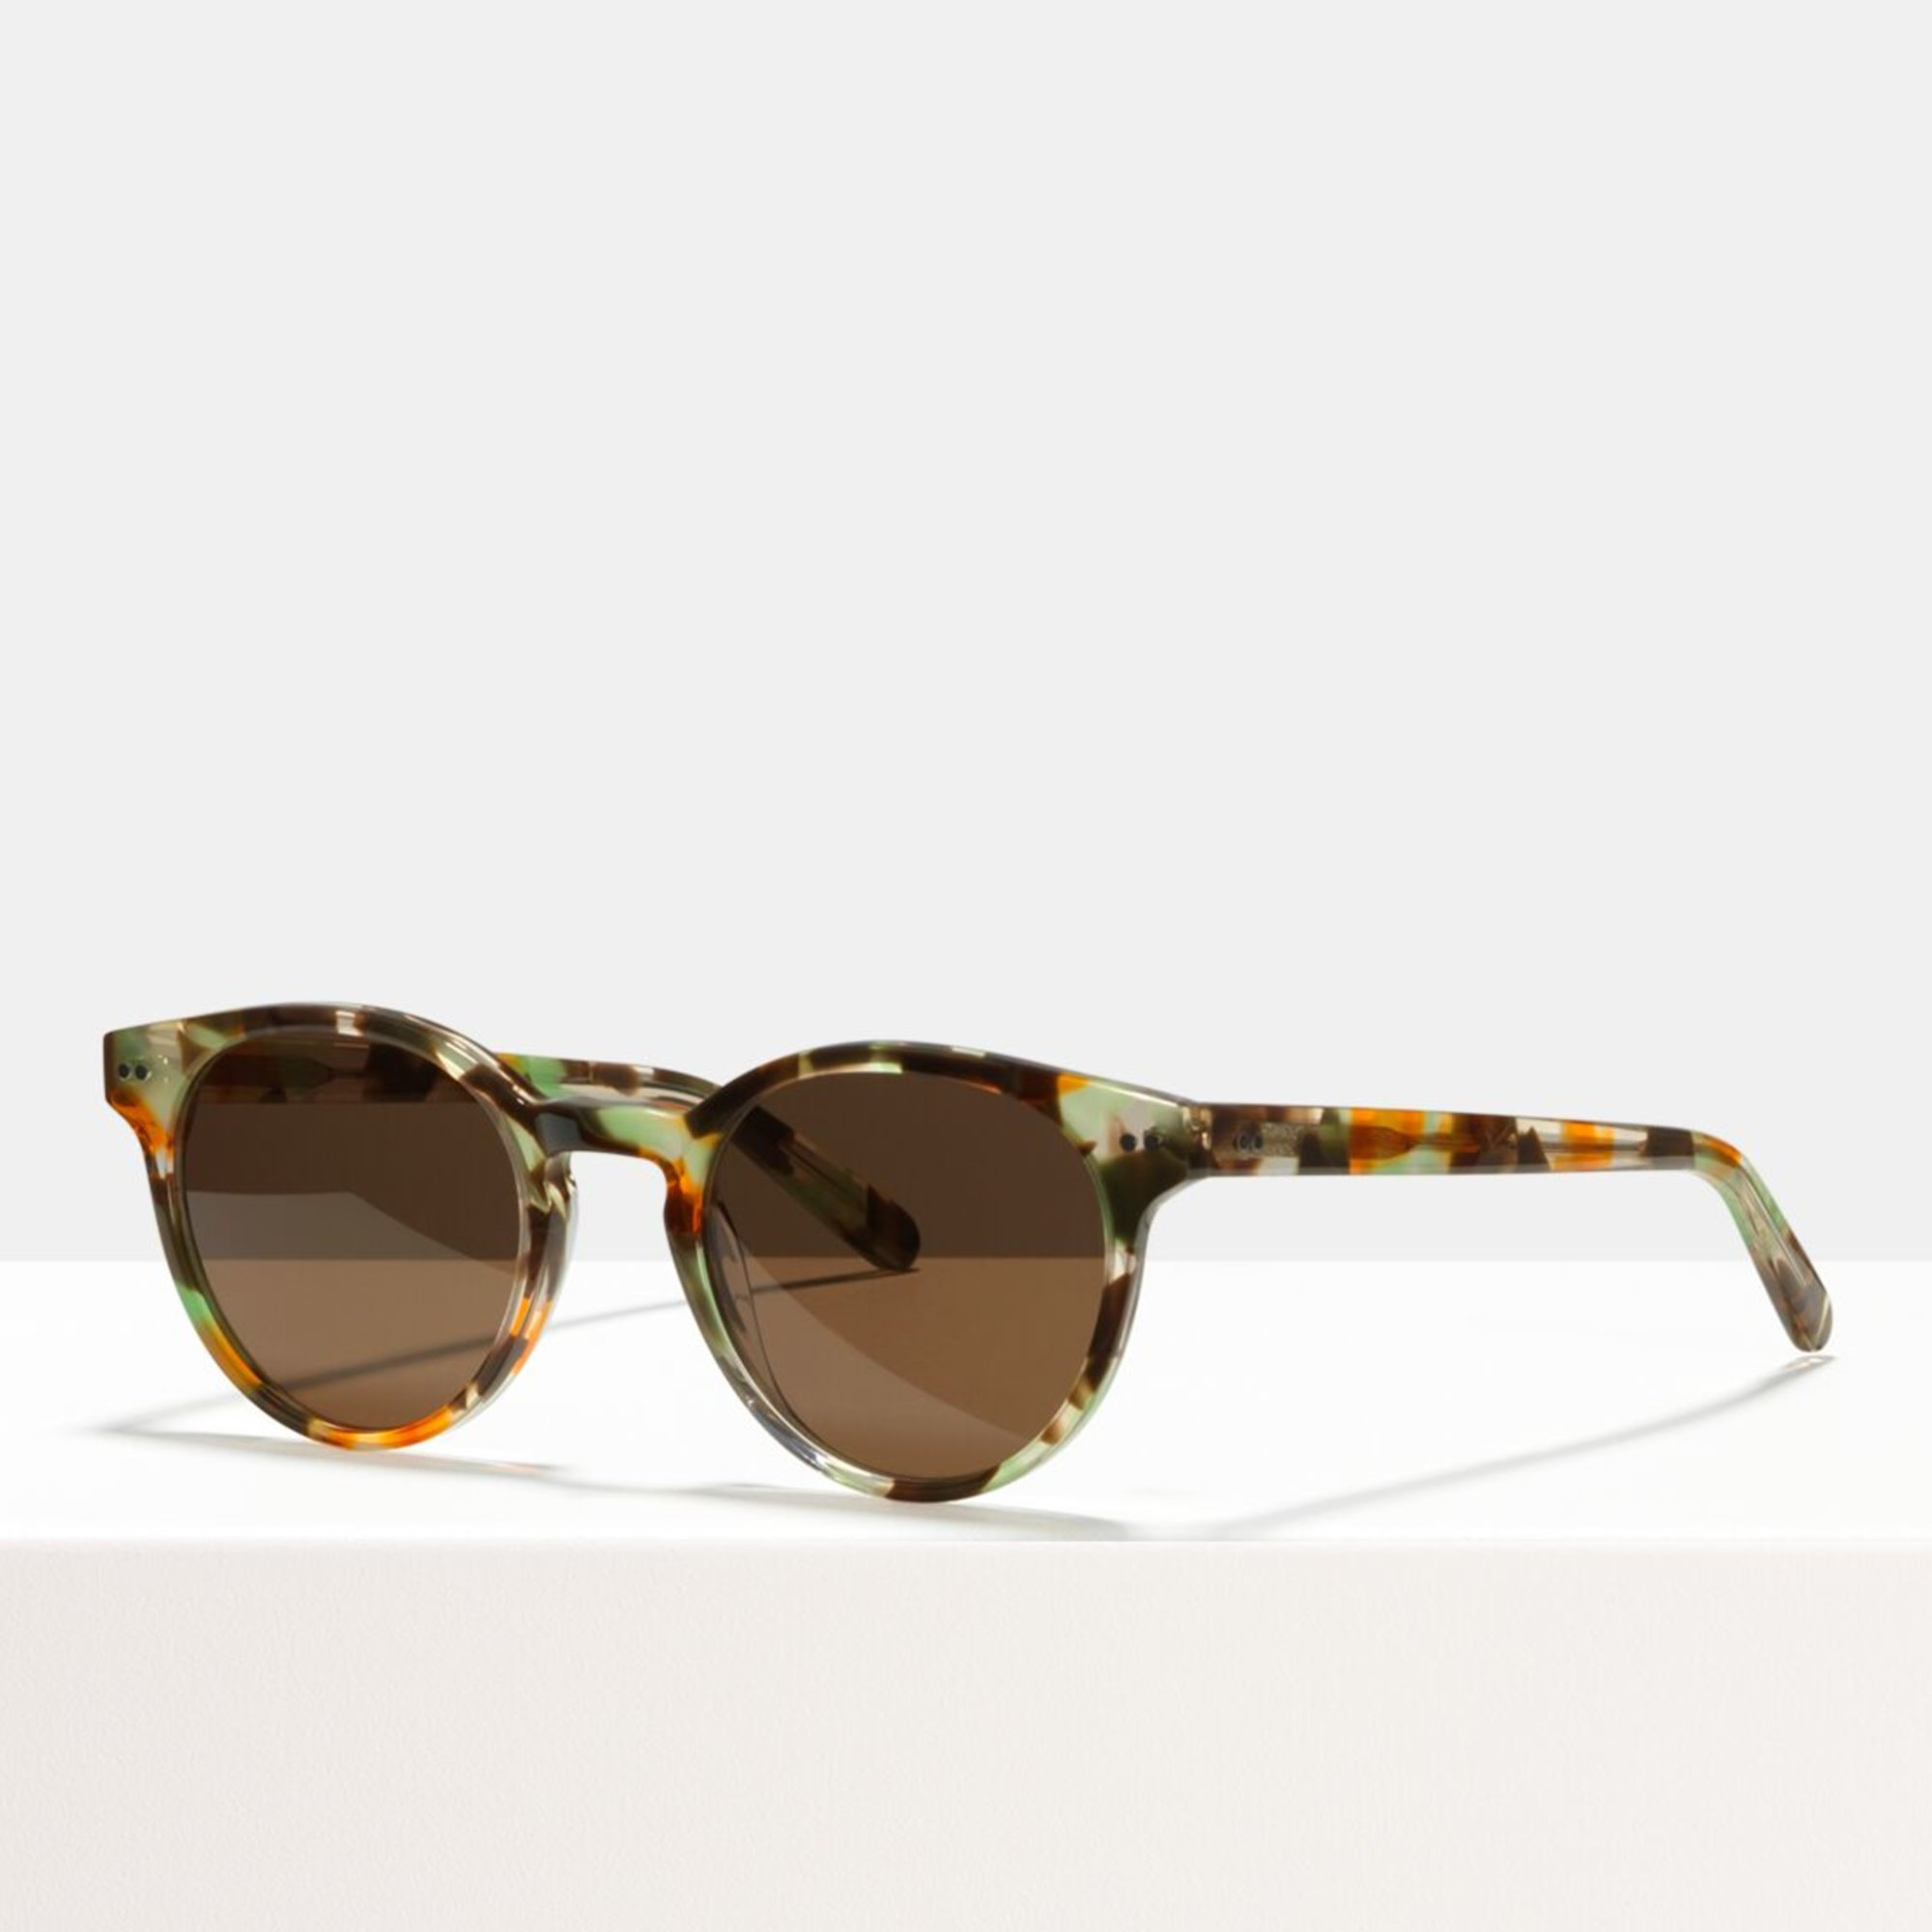 Ace & Tate Sunglasses | rund Acetat in Beige, Braun, Grün, multicolor, Orange, Gelb